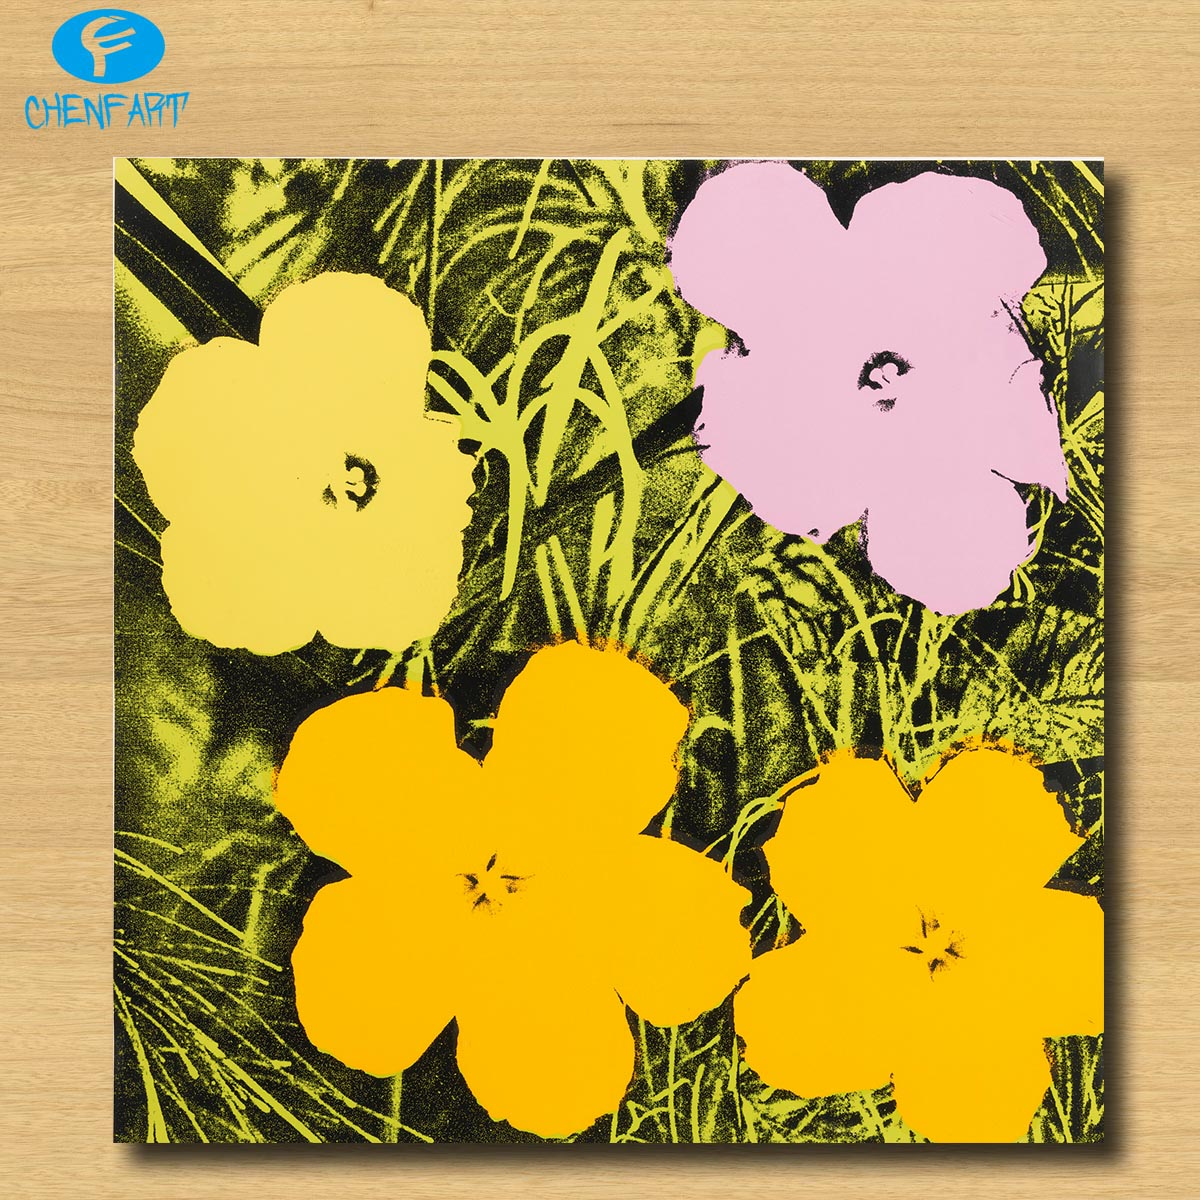 Huge FLOWERS (F. & S. II.69) by Andy Warhol pop art print Wall ...